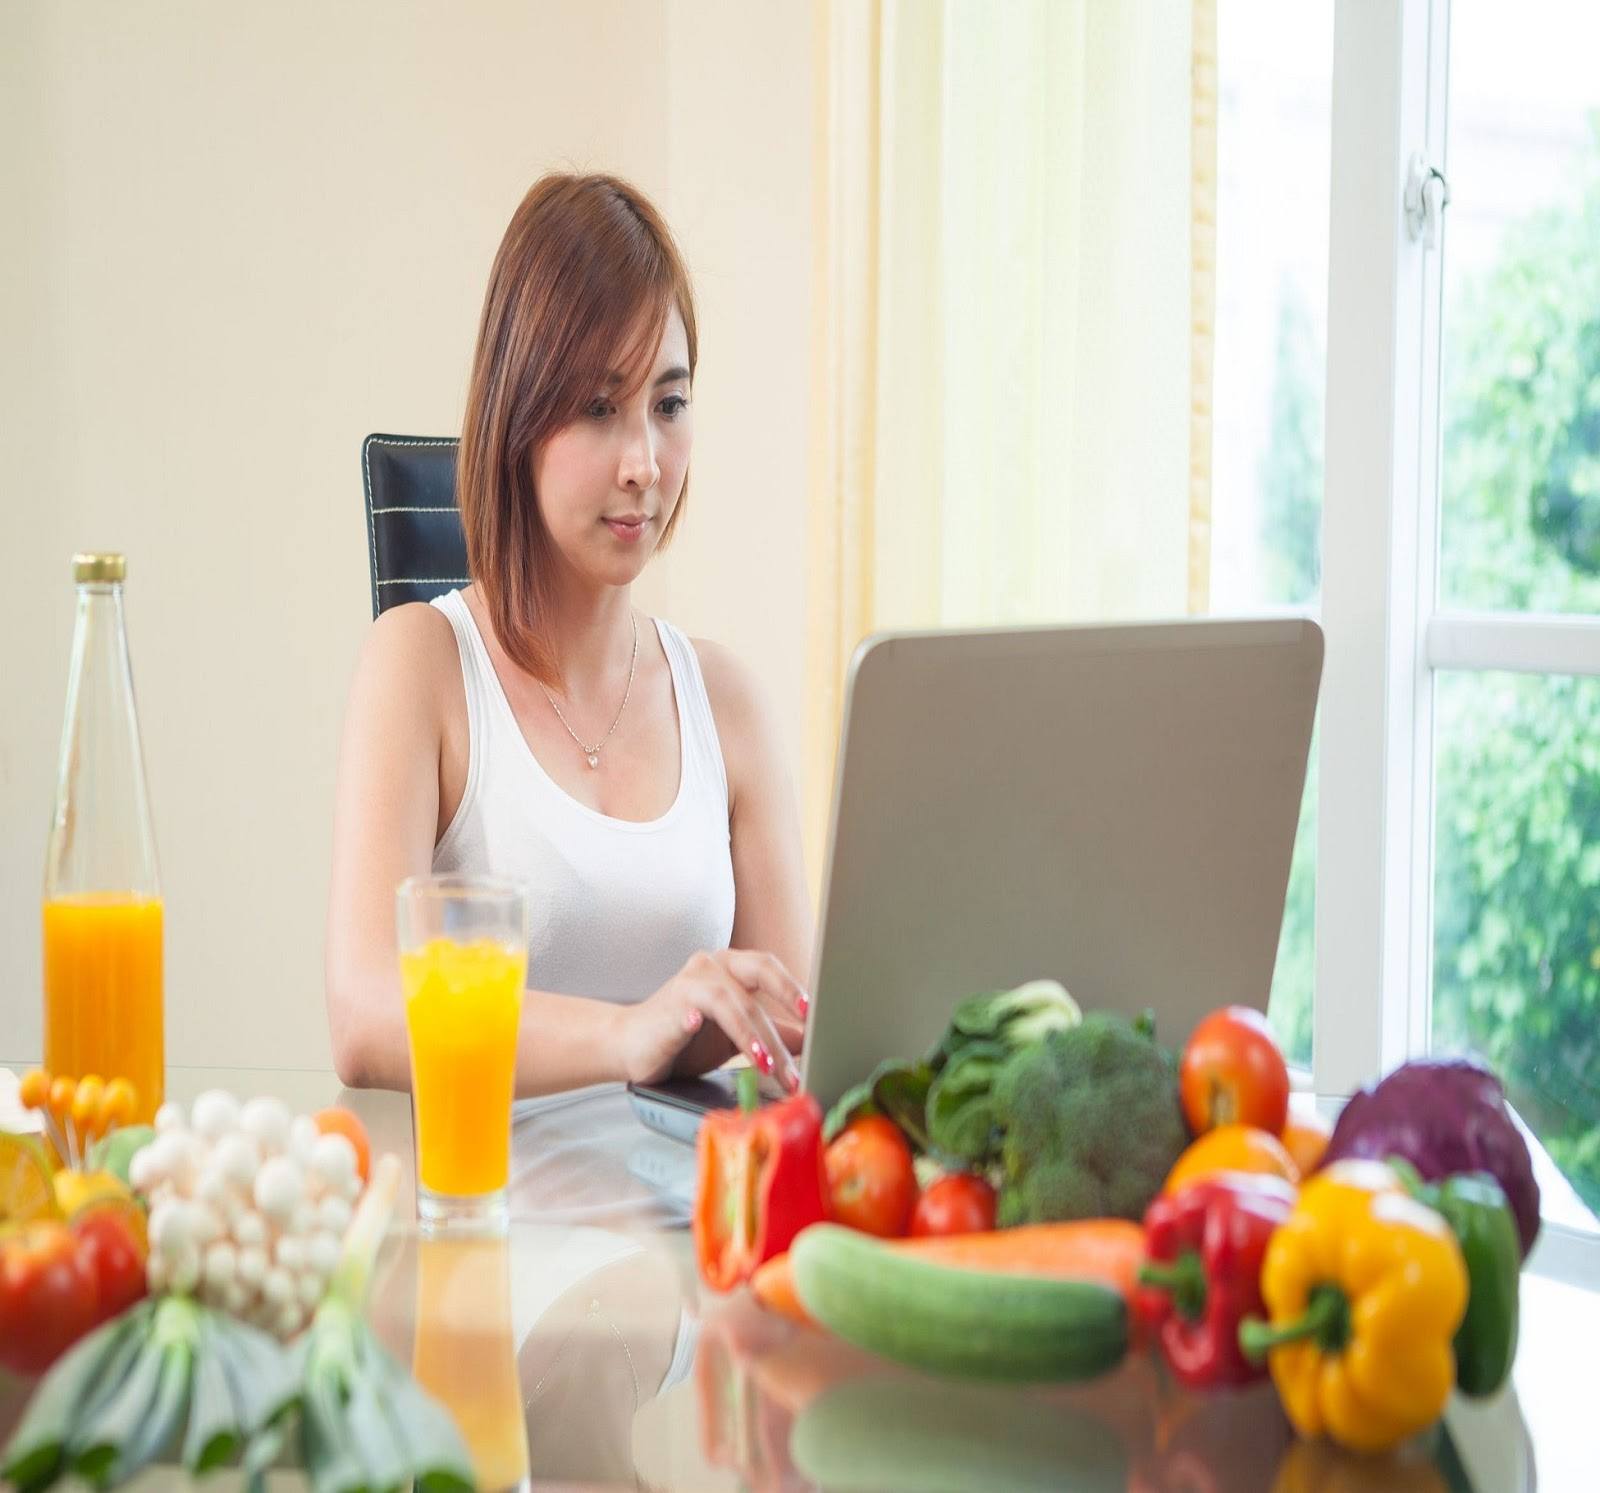 शरीर का वजन तेजी से बढ़ाते हैं ये 5 घरेलू आहार/These Top 5 home foods increase body weight rapidly,weight loss,weight gain